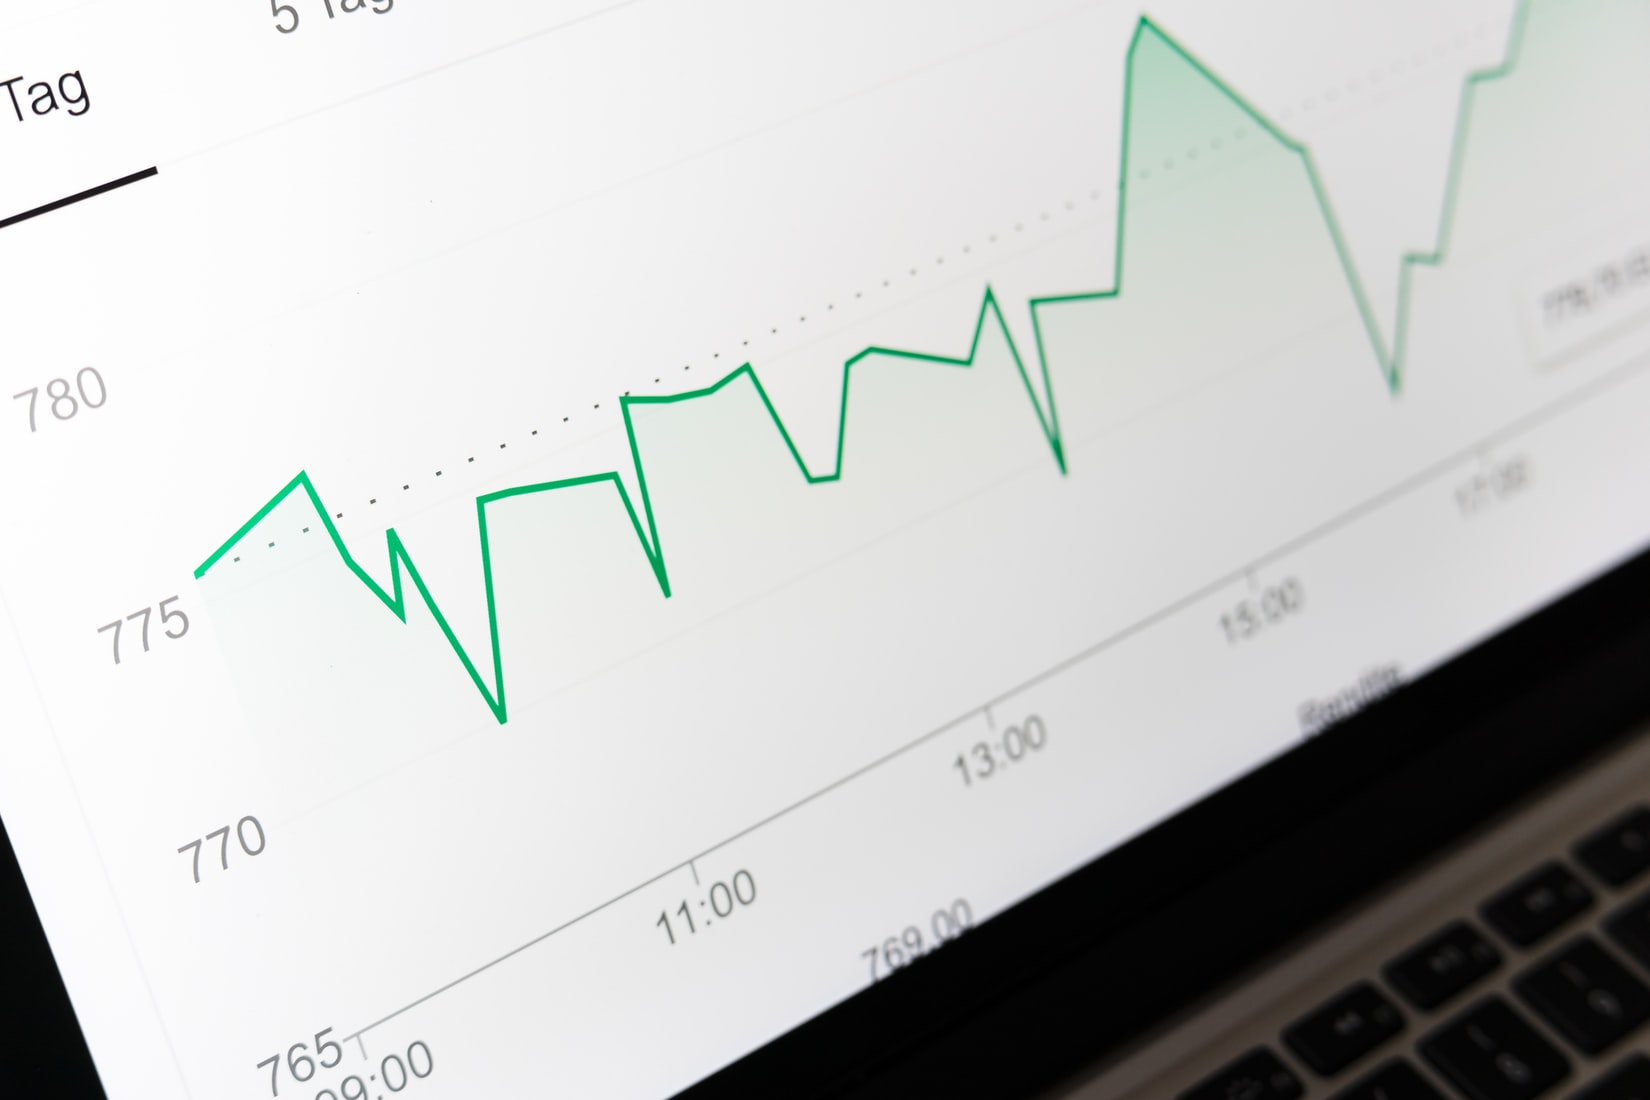 NovoCure Ltd Shares Approach 52-Week High - Market Mover